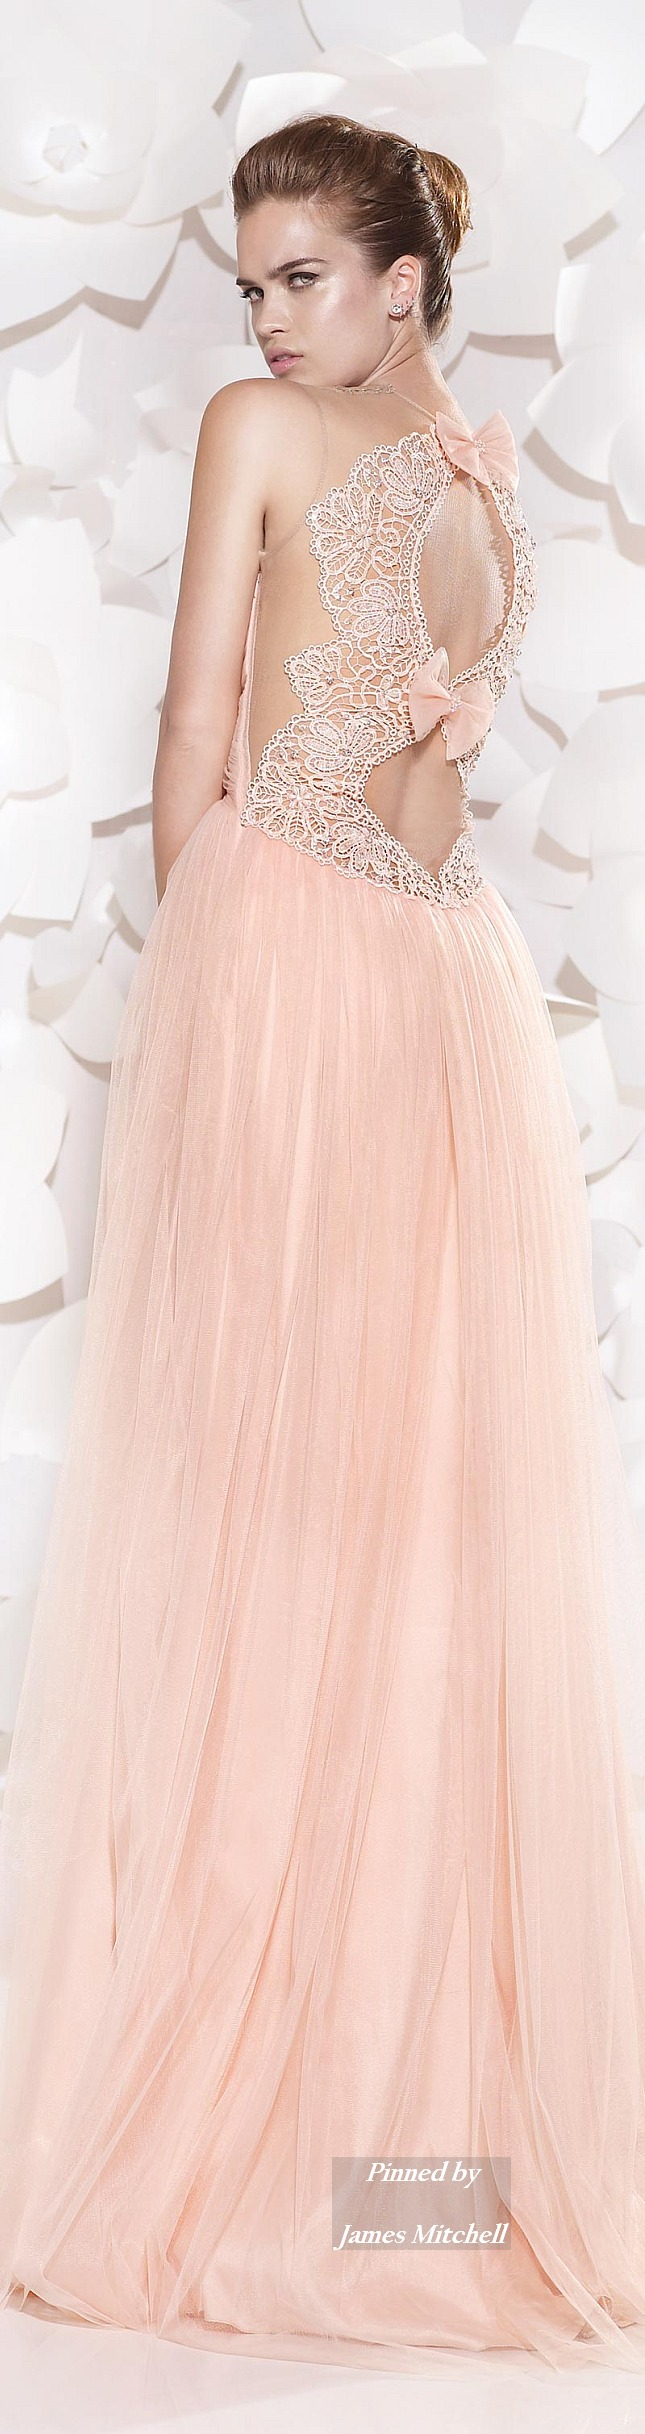 Tarik Ediz 2015 Collection   The World of Fashion   Pinterest ...